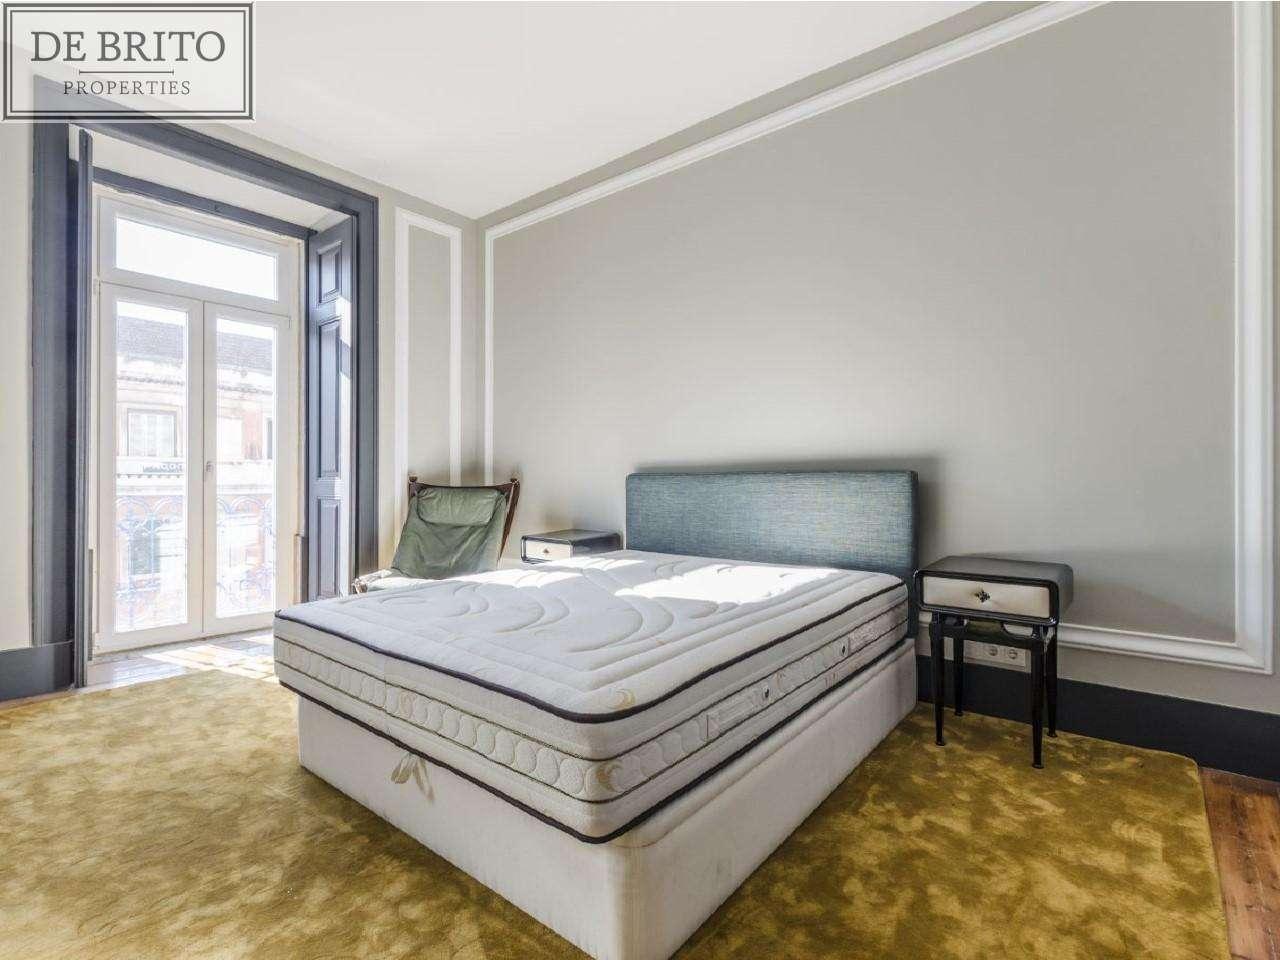 Apartamento para comprar, Misericórdia, Lisboa - Foto 8